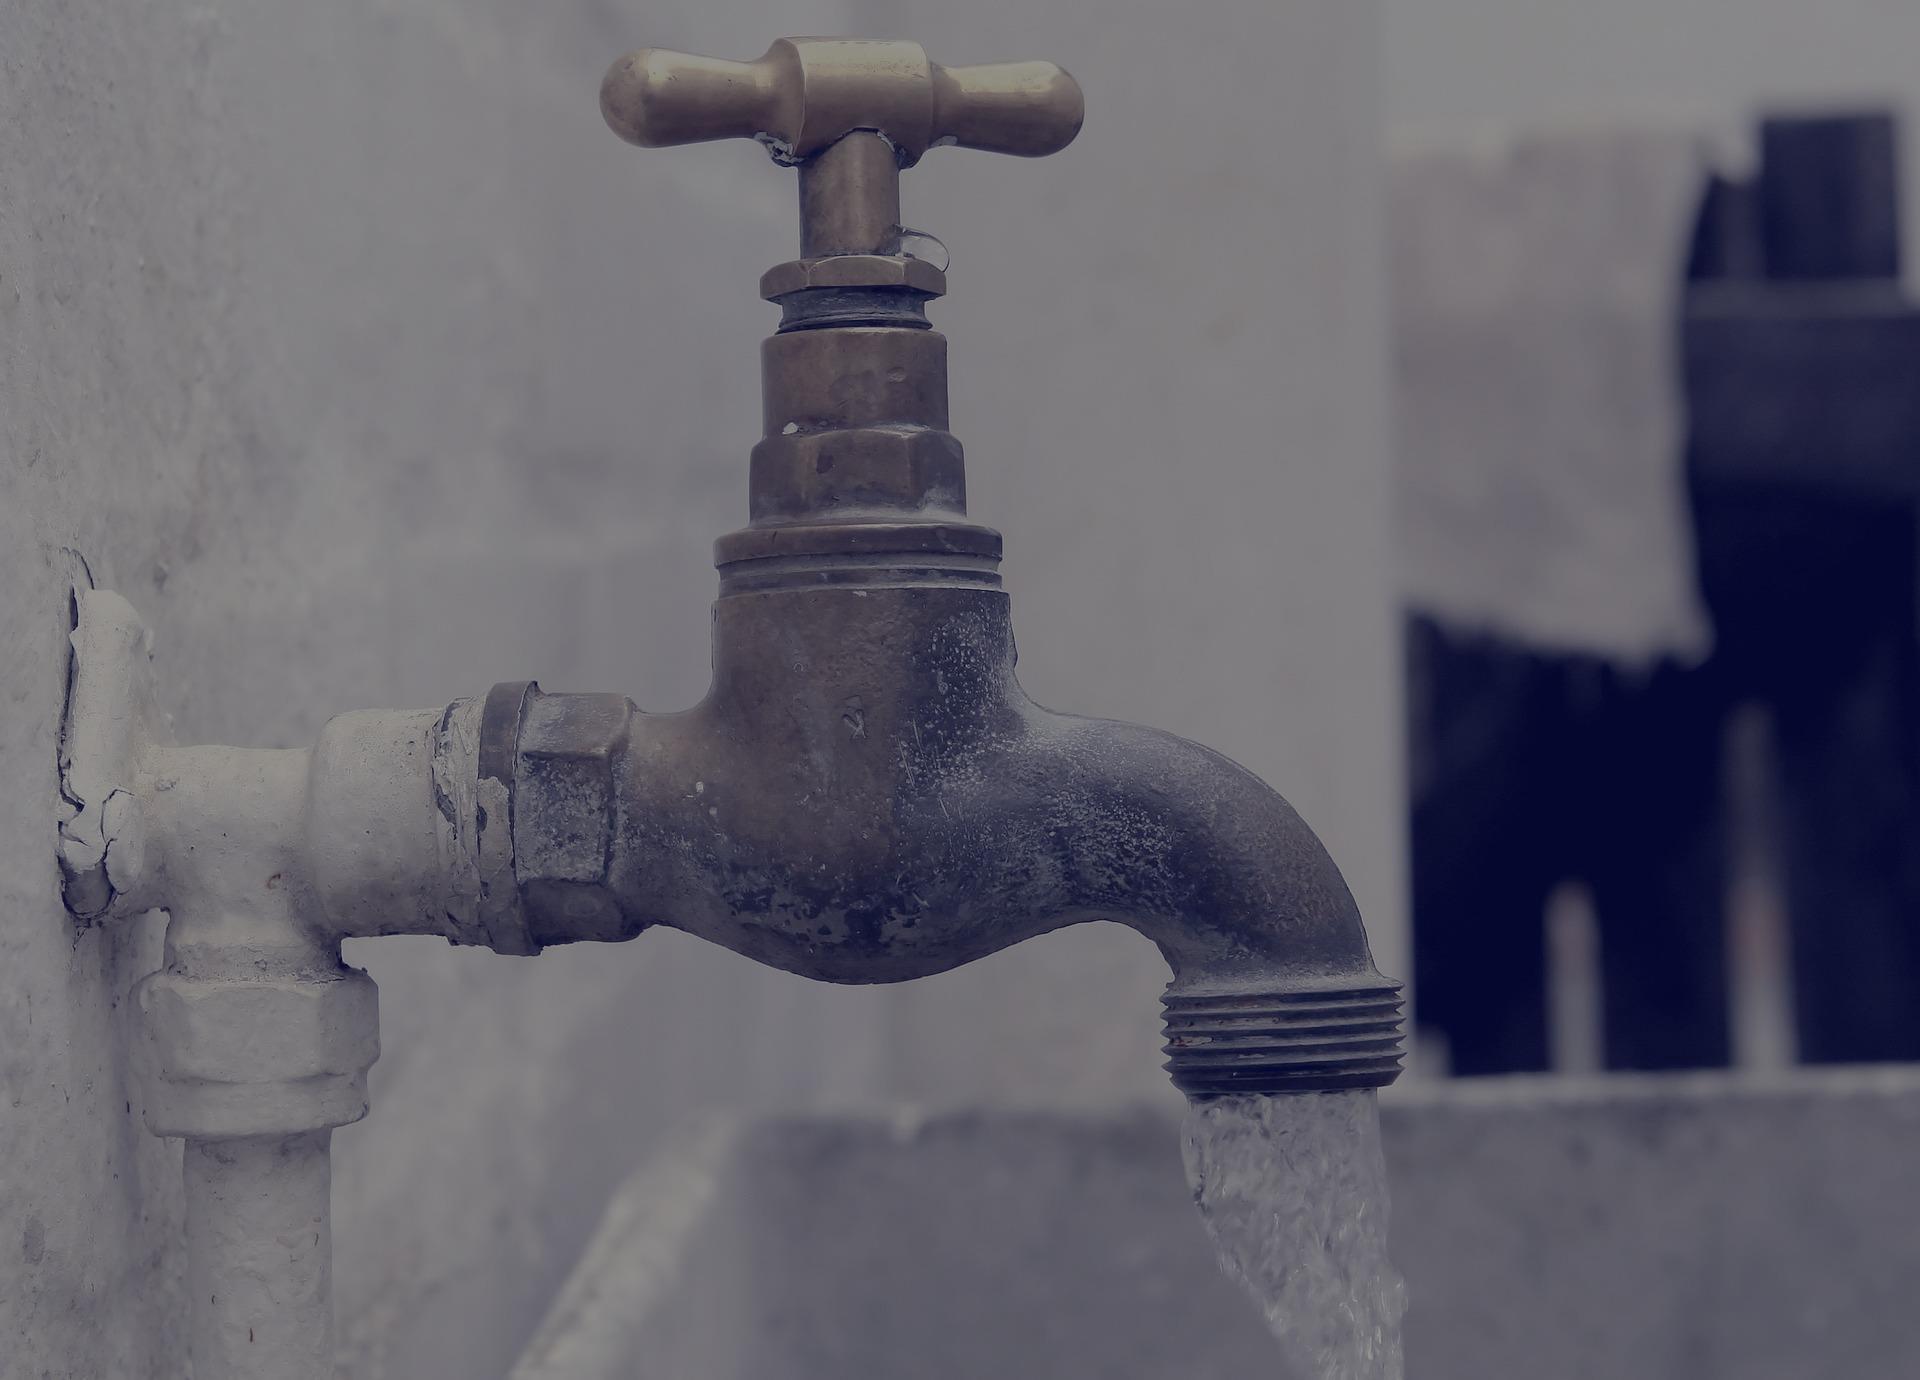 amherst plumbing